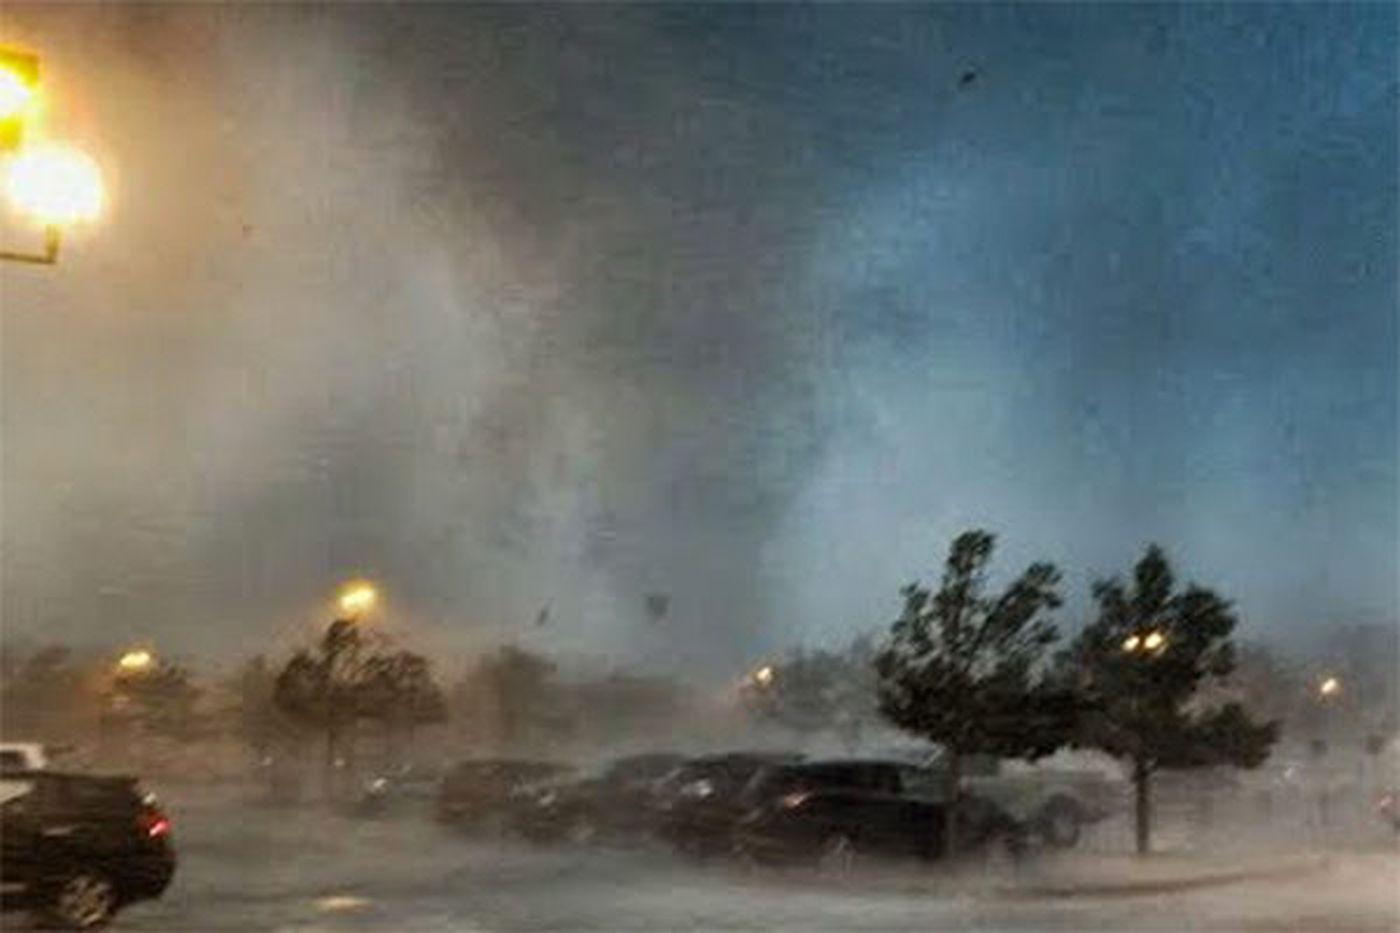 Watch: Confirmed tornado rips through Home Depot parking lot in New Jersey